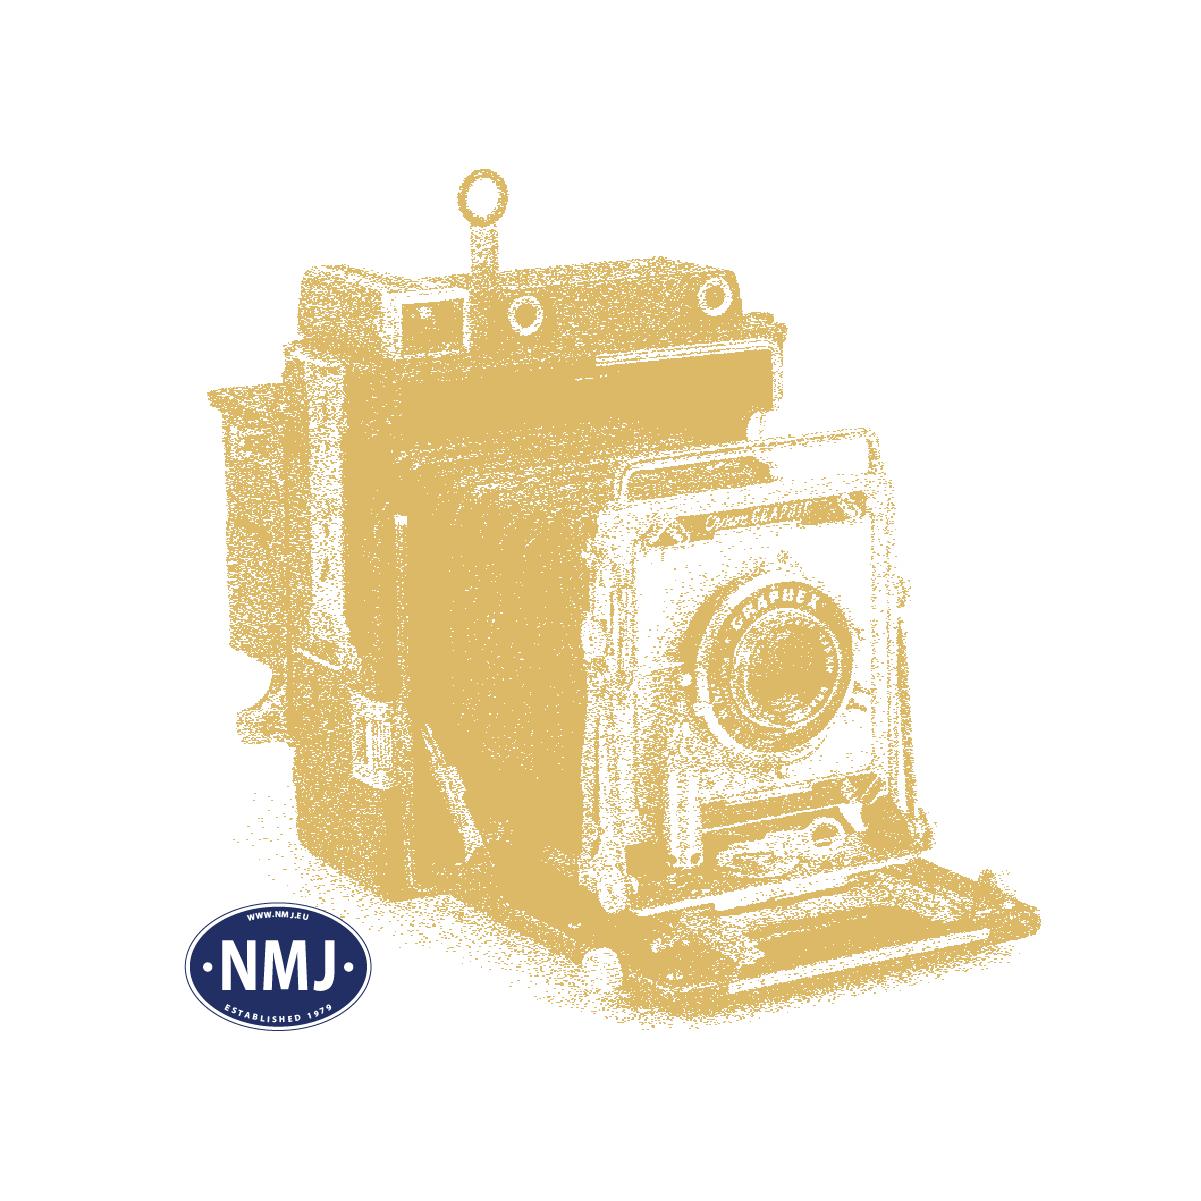 ZIMMX681N - MX681N Funksjonsdekoder, NEM 651